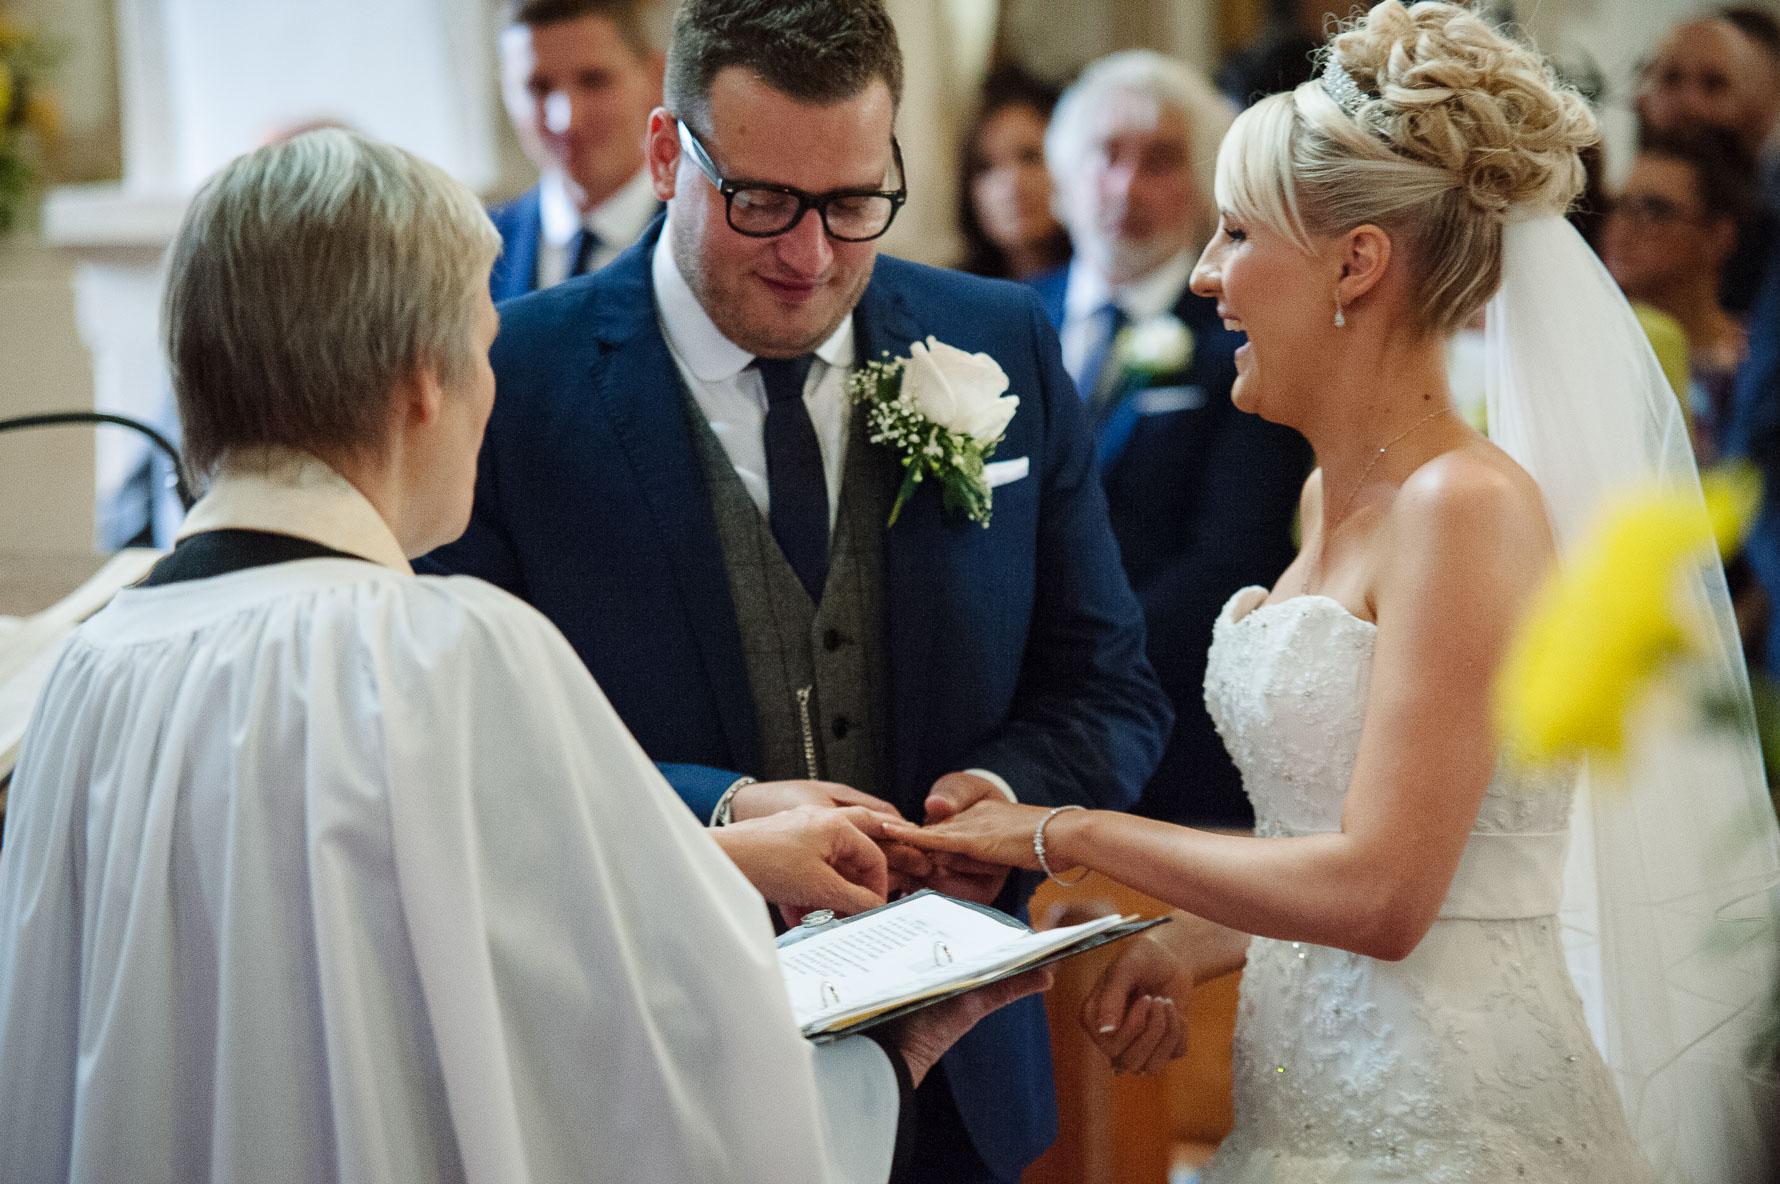 Canterbury Cathedral Lodge Wedding26-20141004 0462